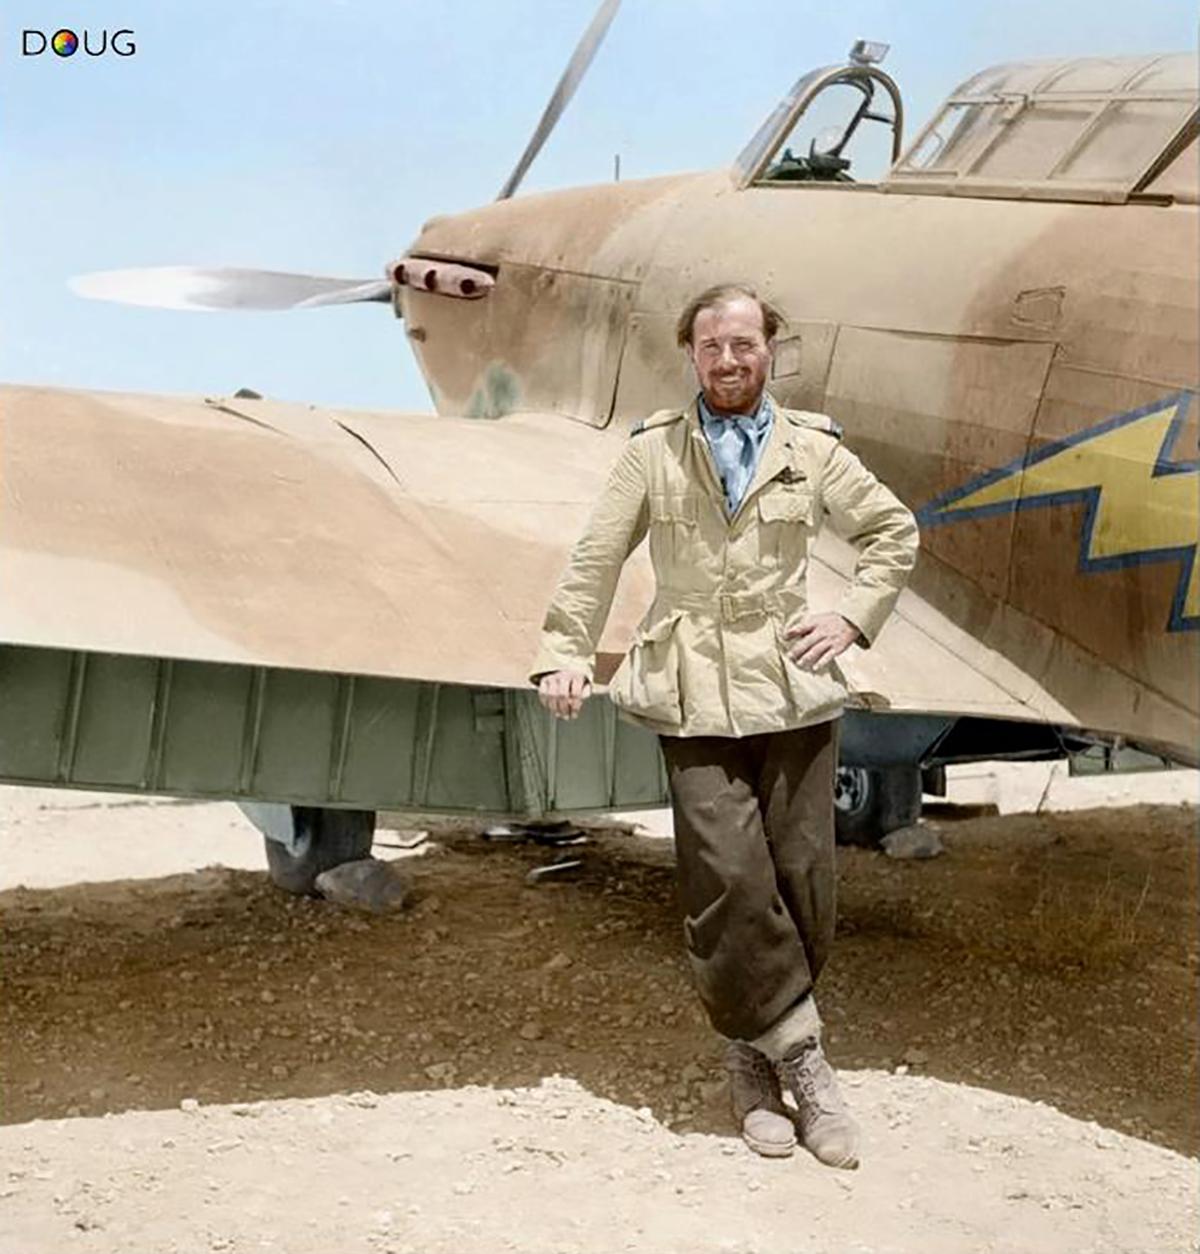 Aircrew RAF 274Sqn FlLt Dudley SG Honor poses by a Hurricane at Gerawala Egypt 01